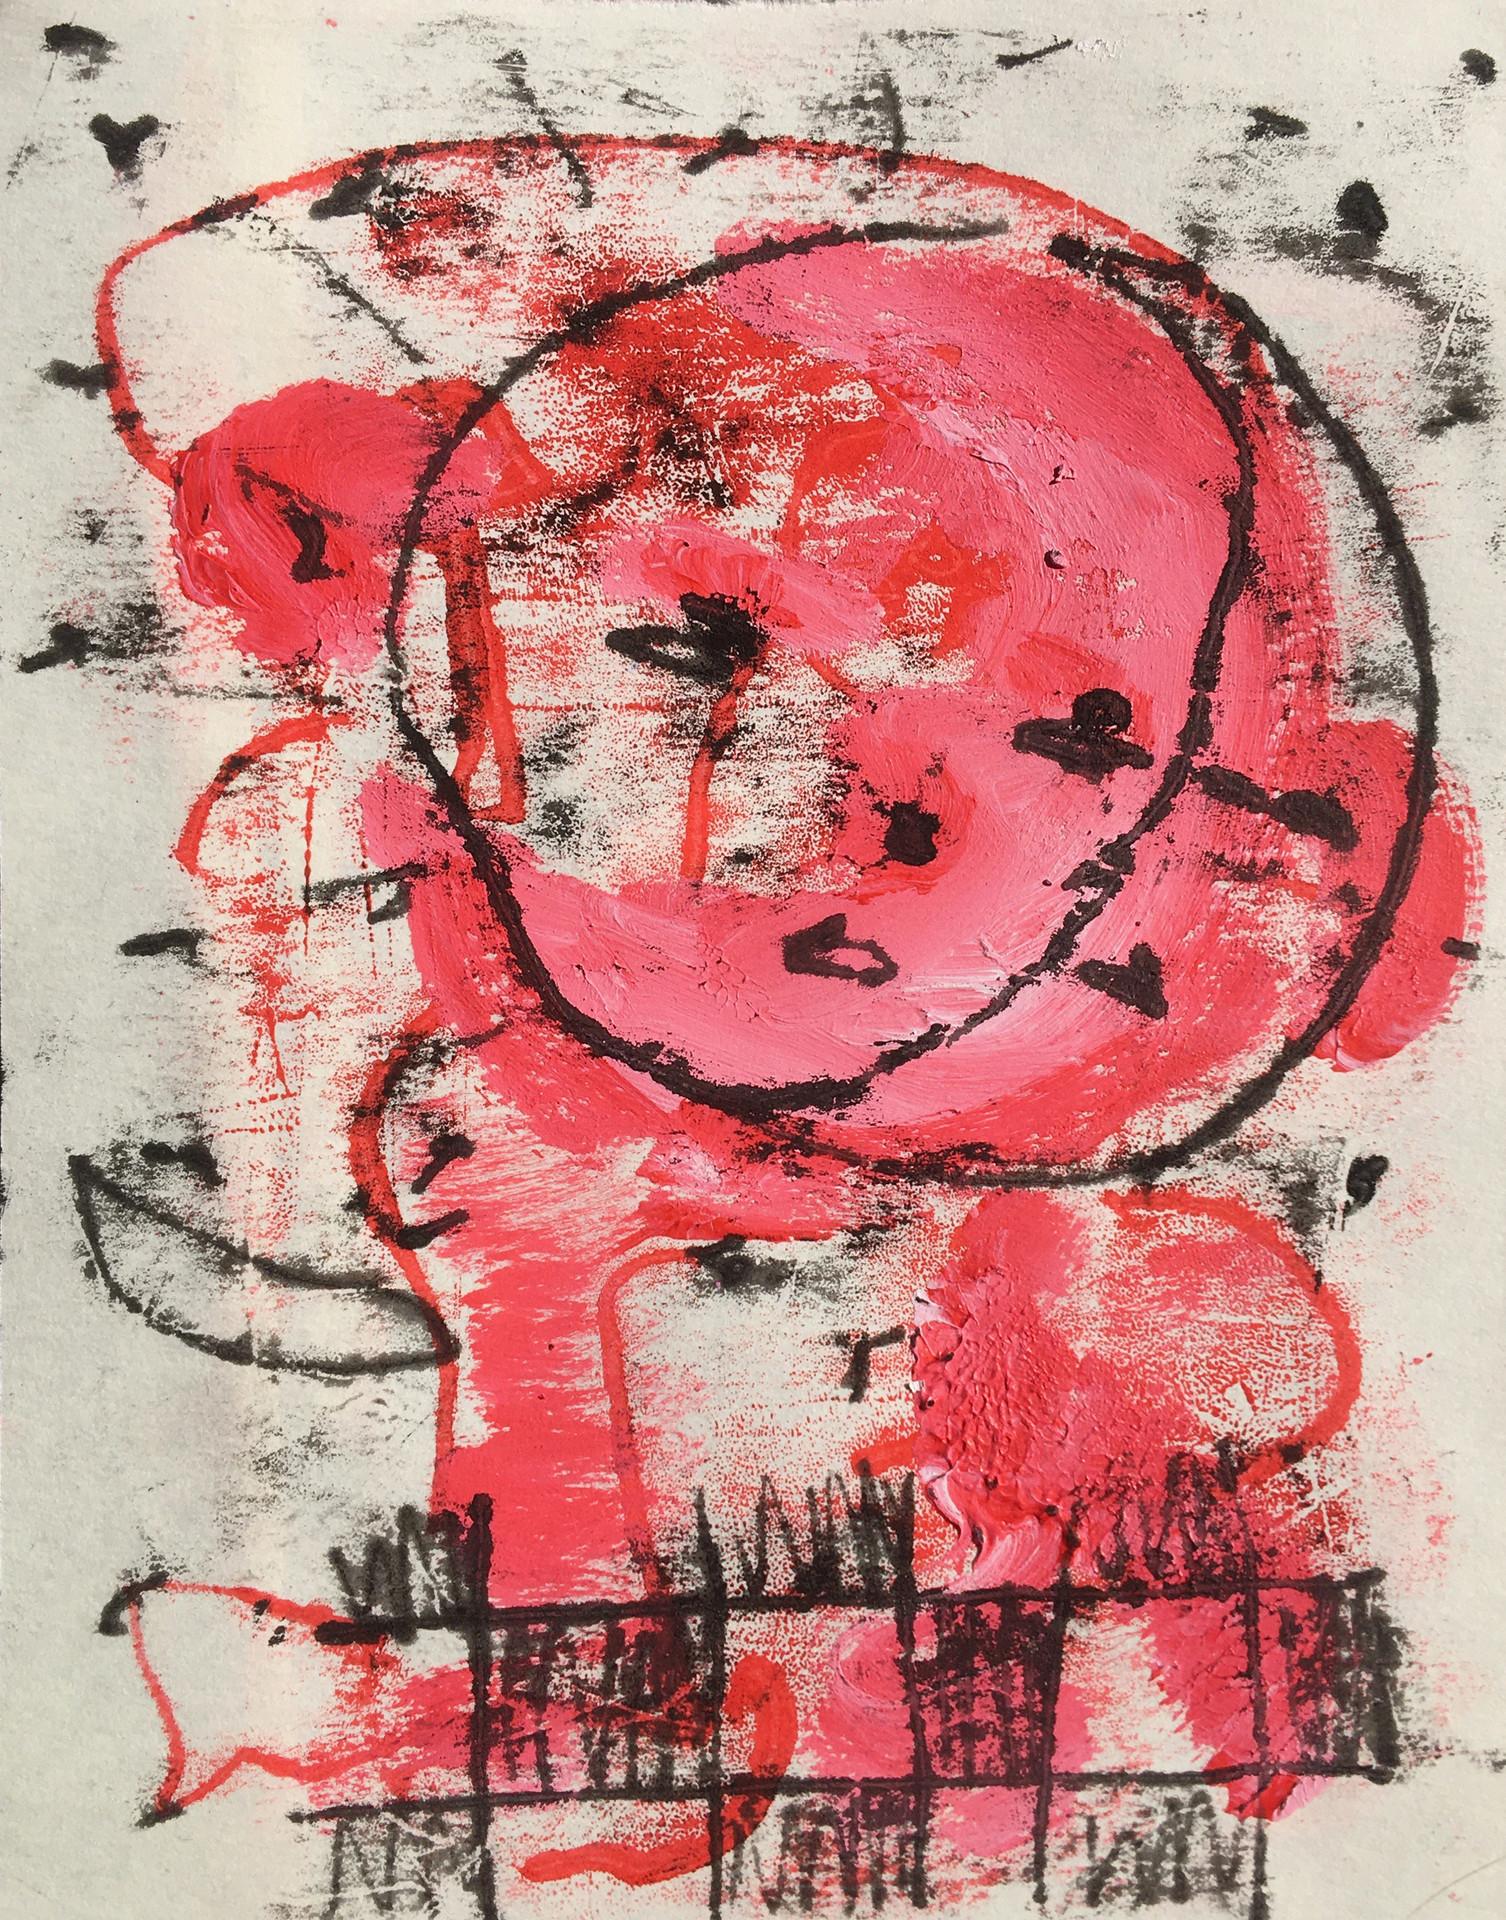 A Heartfelt Embrace Between Two Satellites, 2020  mono print on paper, 12 x 16 cm